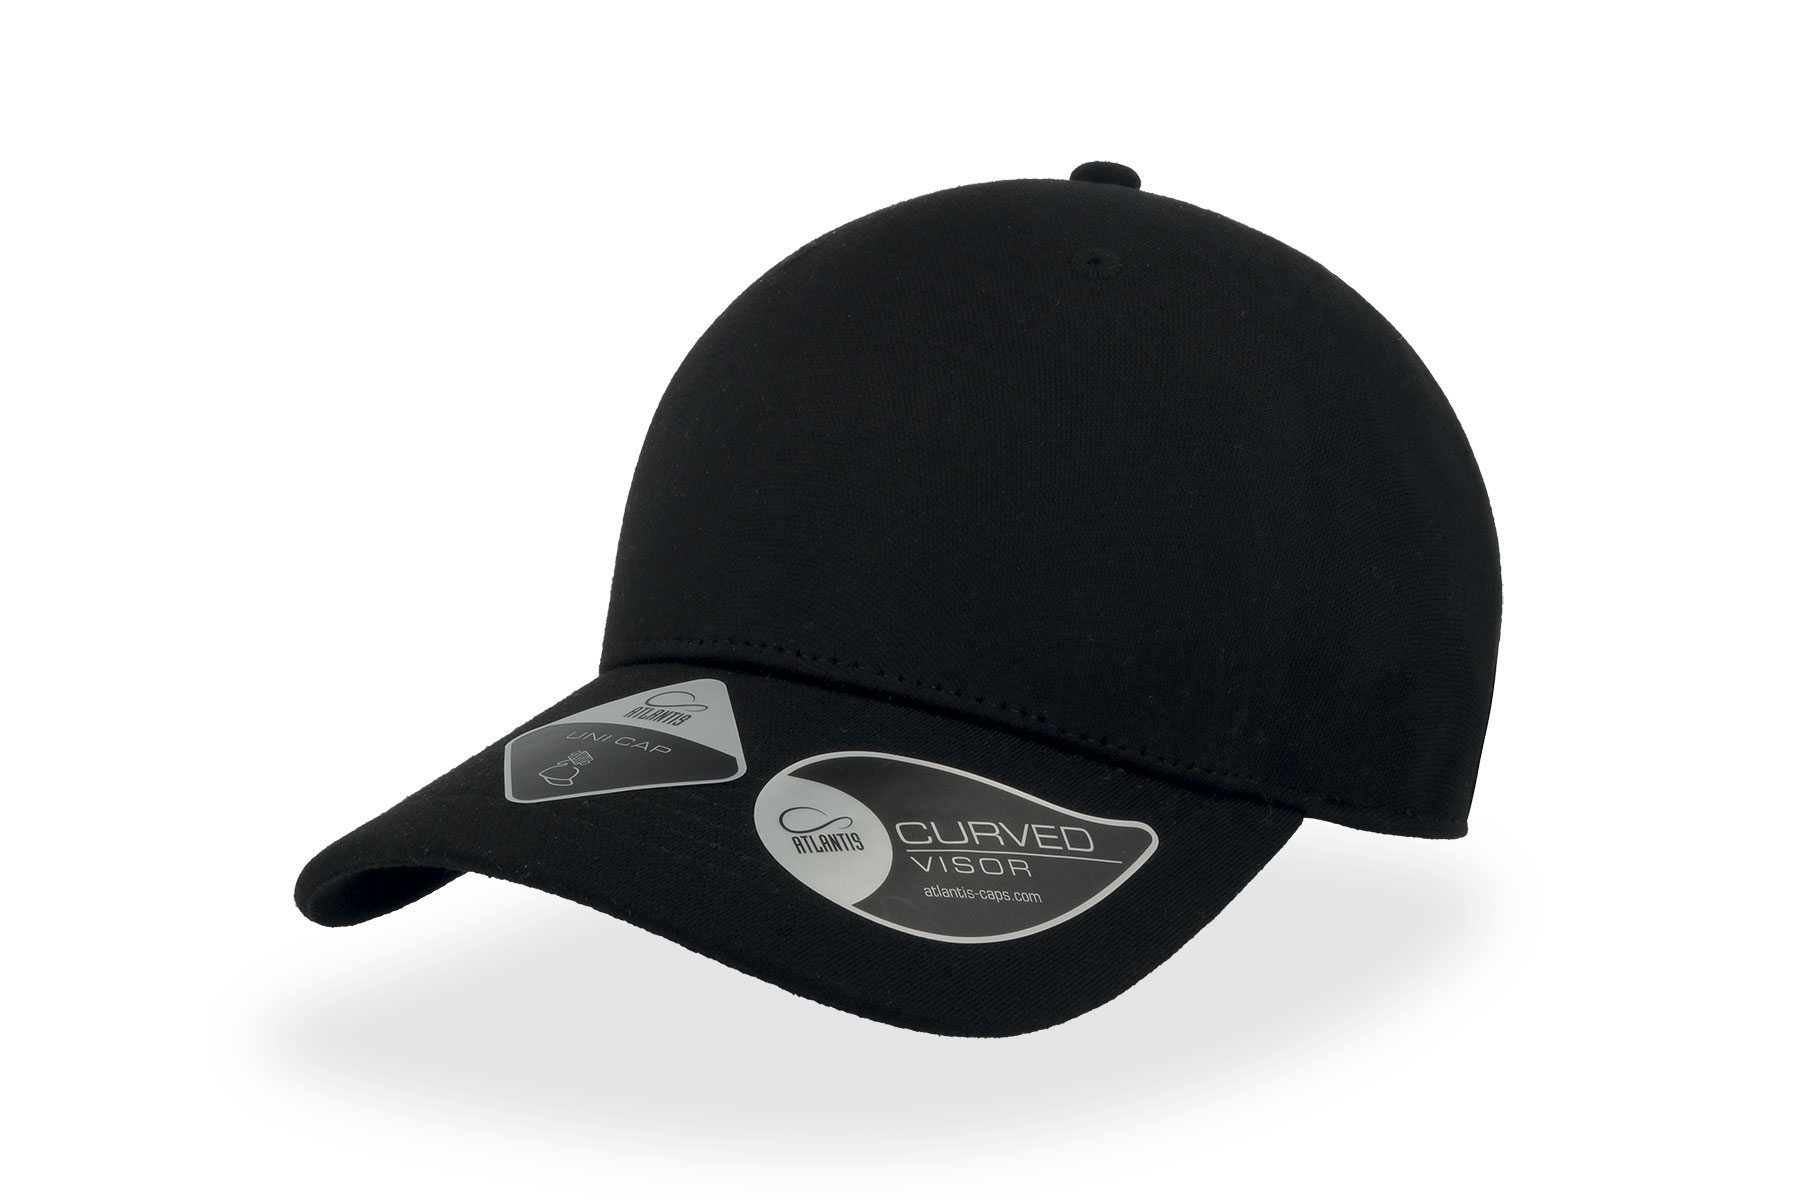 Uni-Cap Piquet -lippis - NEW 2019 ATLANTIS CAPS & HATS - UNPI - 2